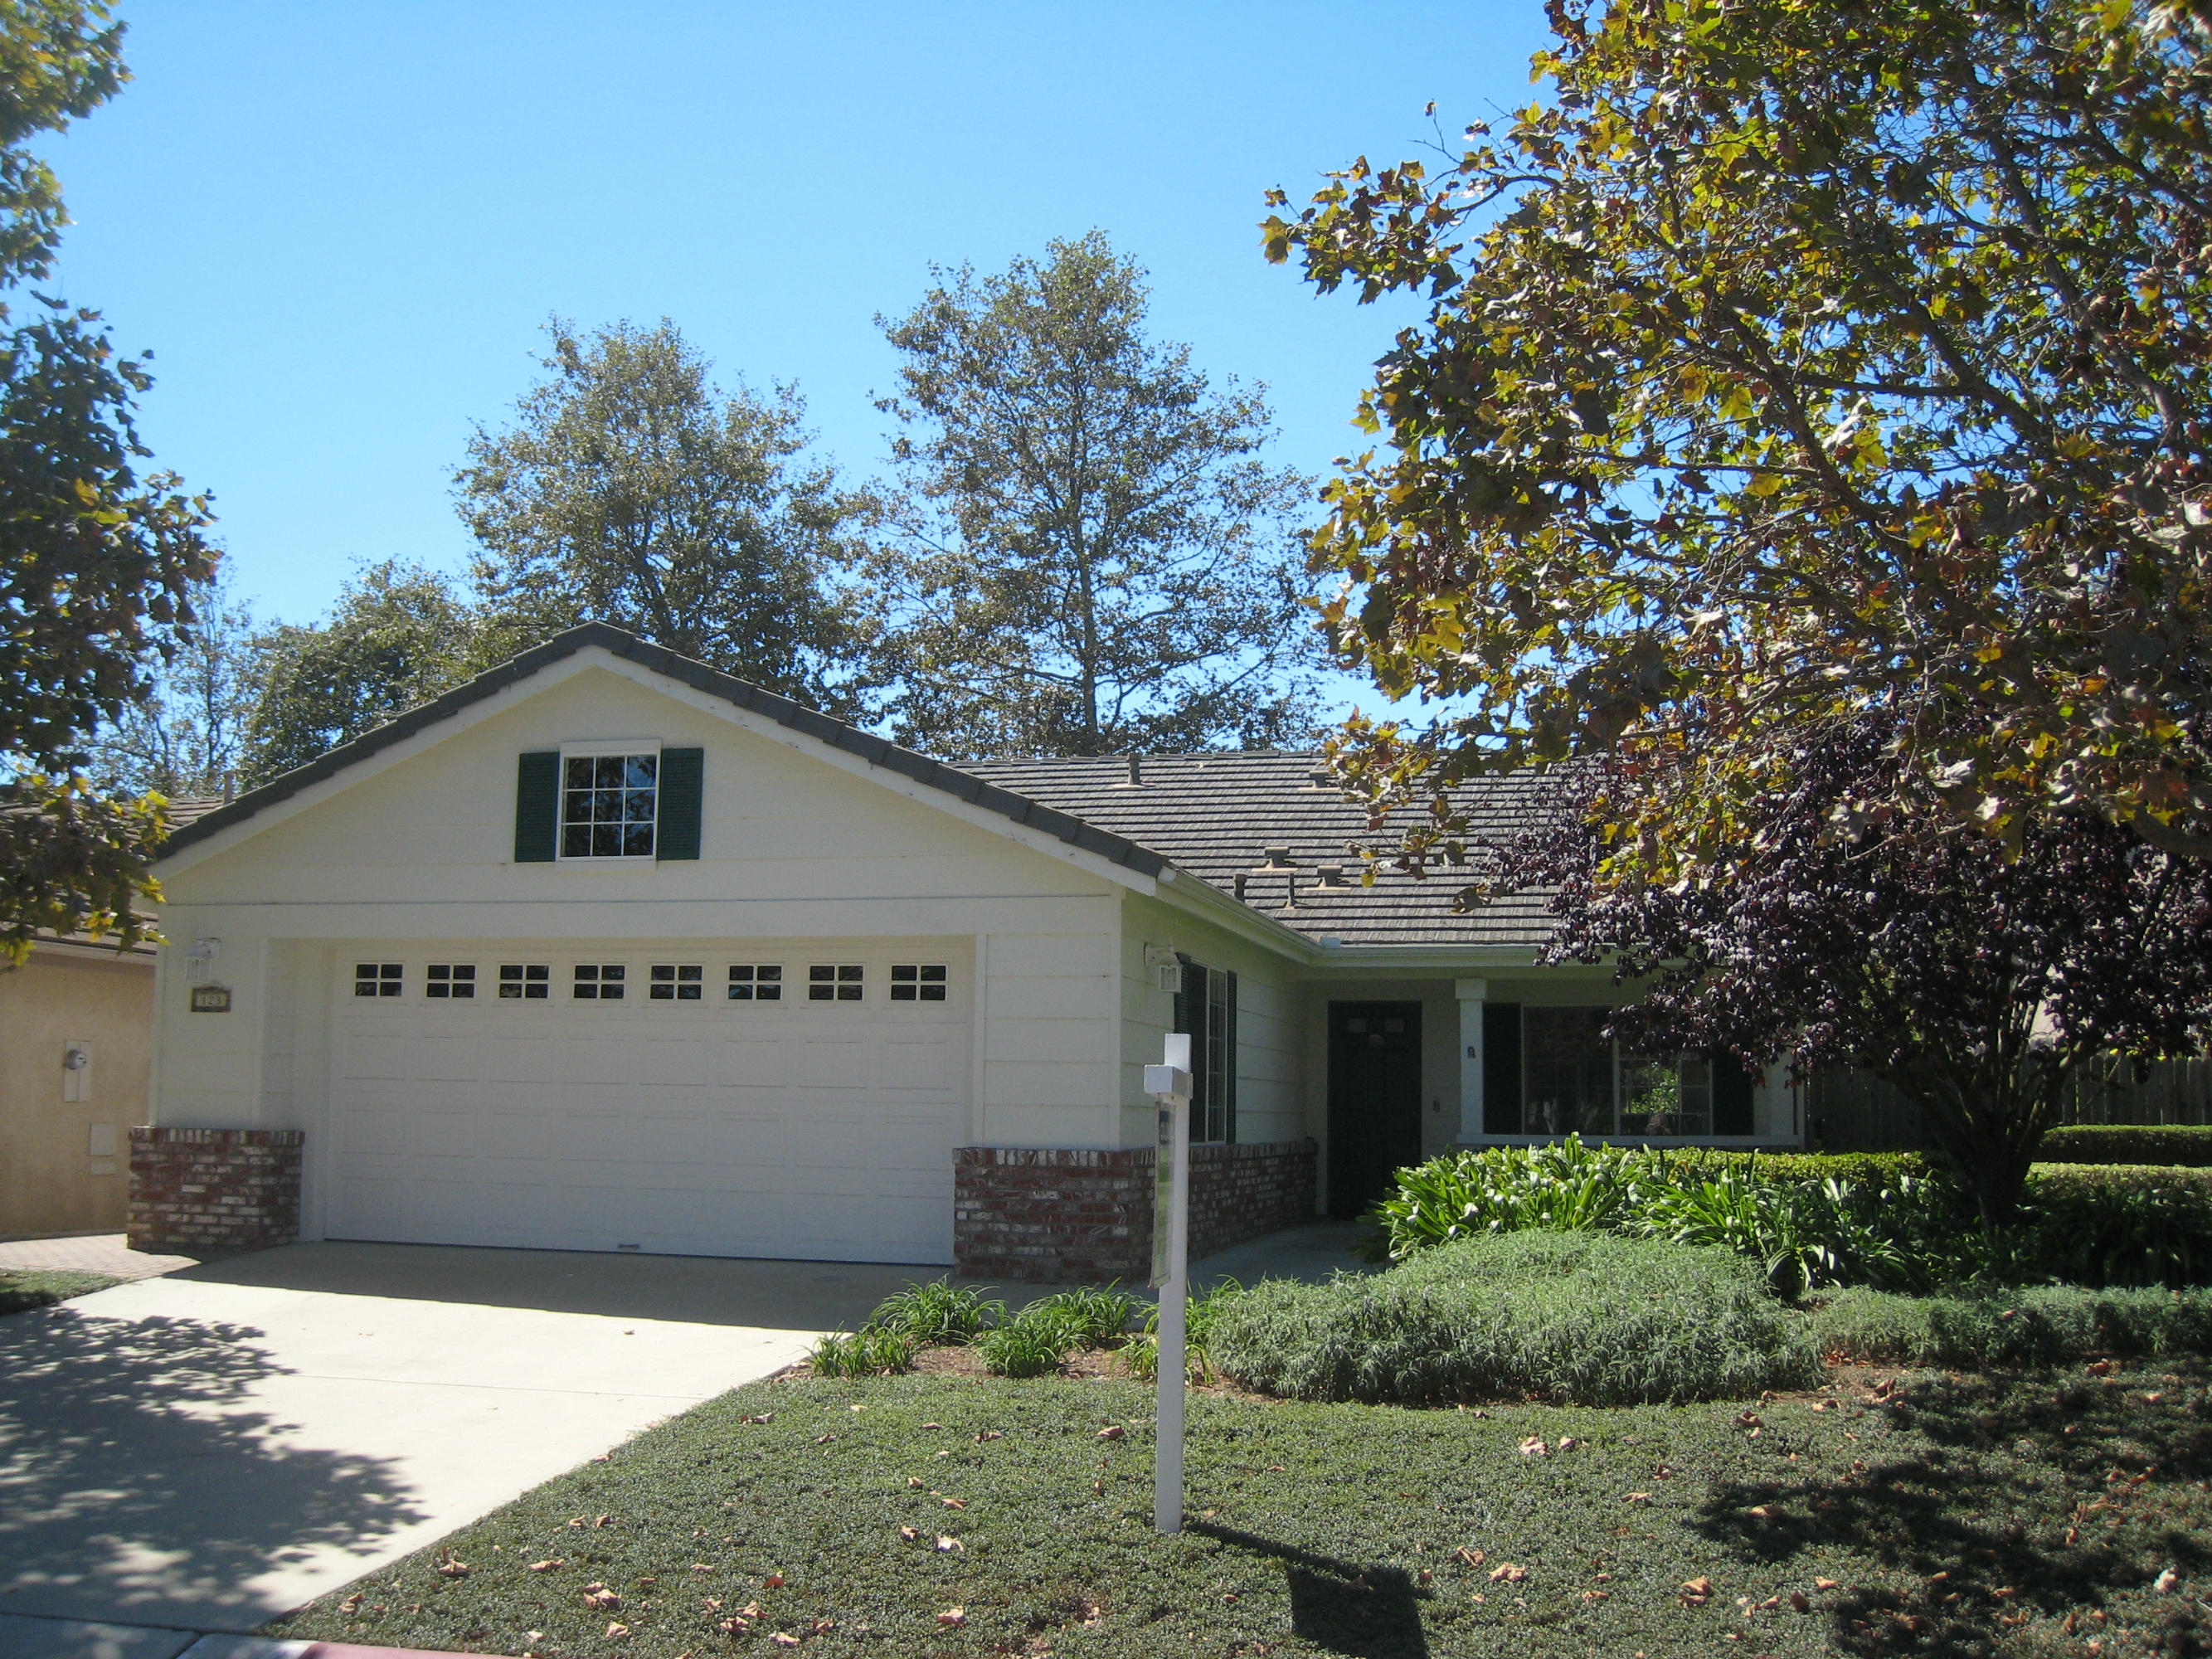 Property photo for 123 Gerard Dr Goleta, California 93117 - 13-2983